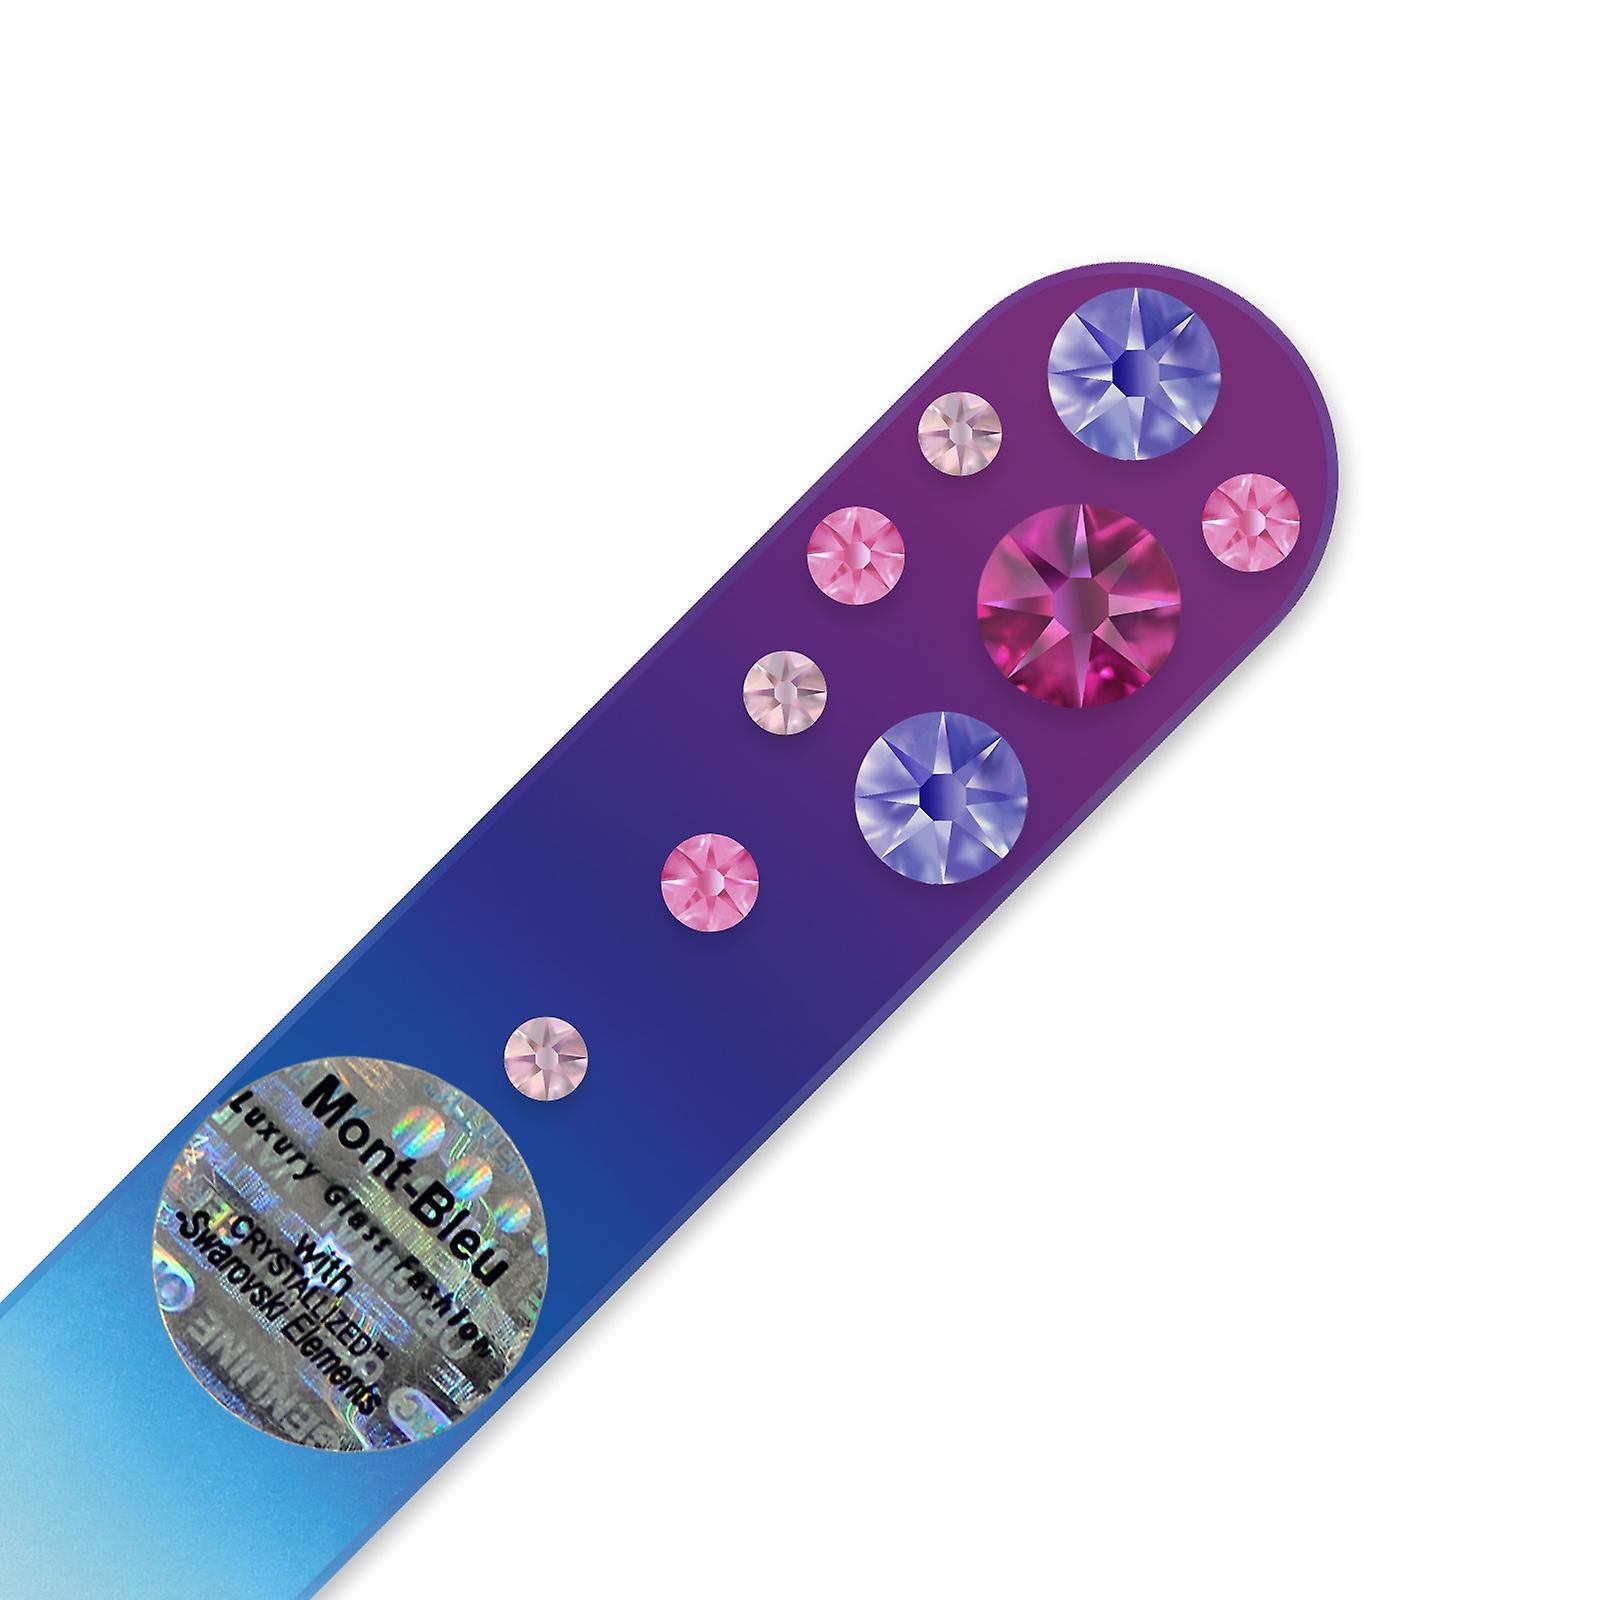 File s1 Mini Nail Crystal 12 Wc edBrCxo